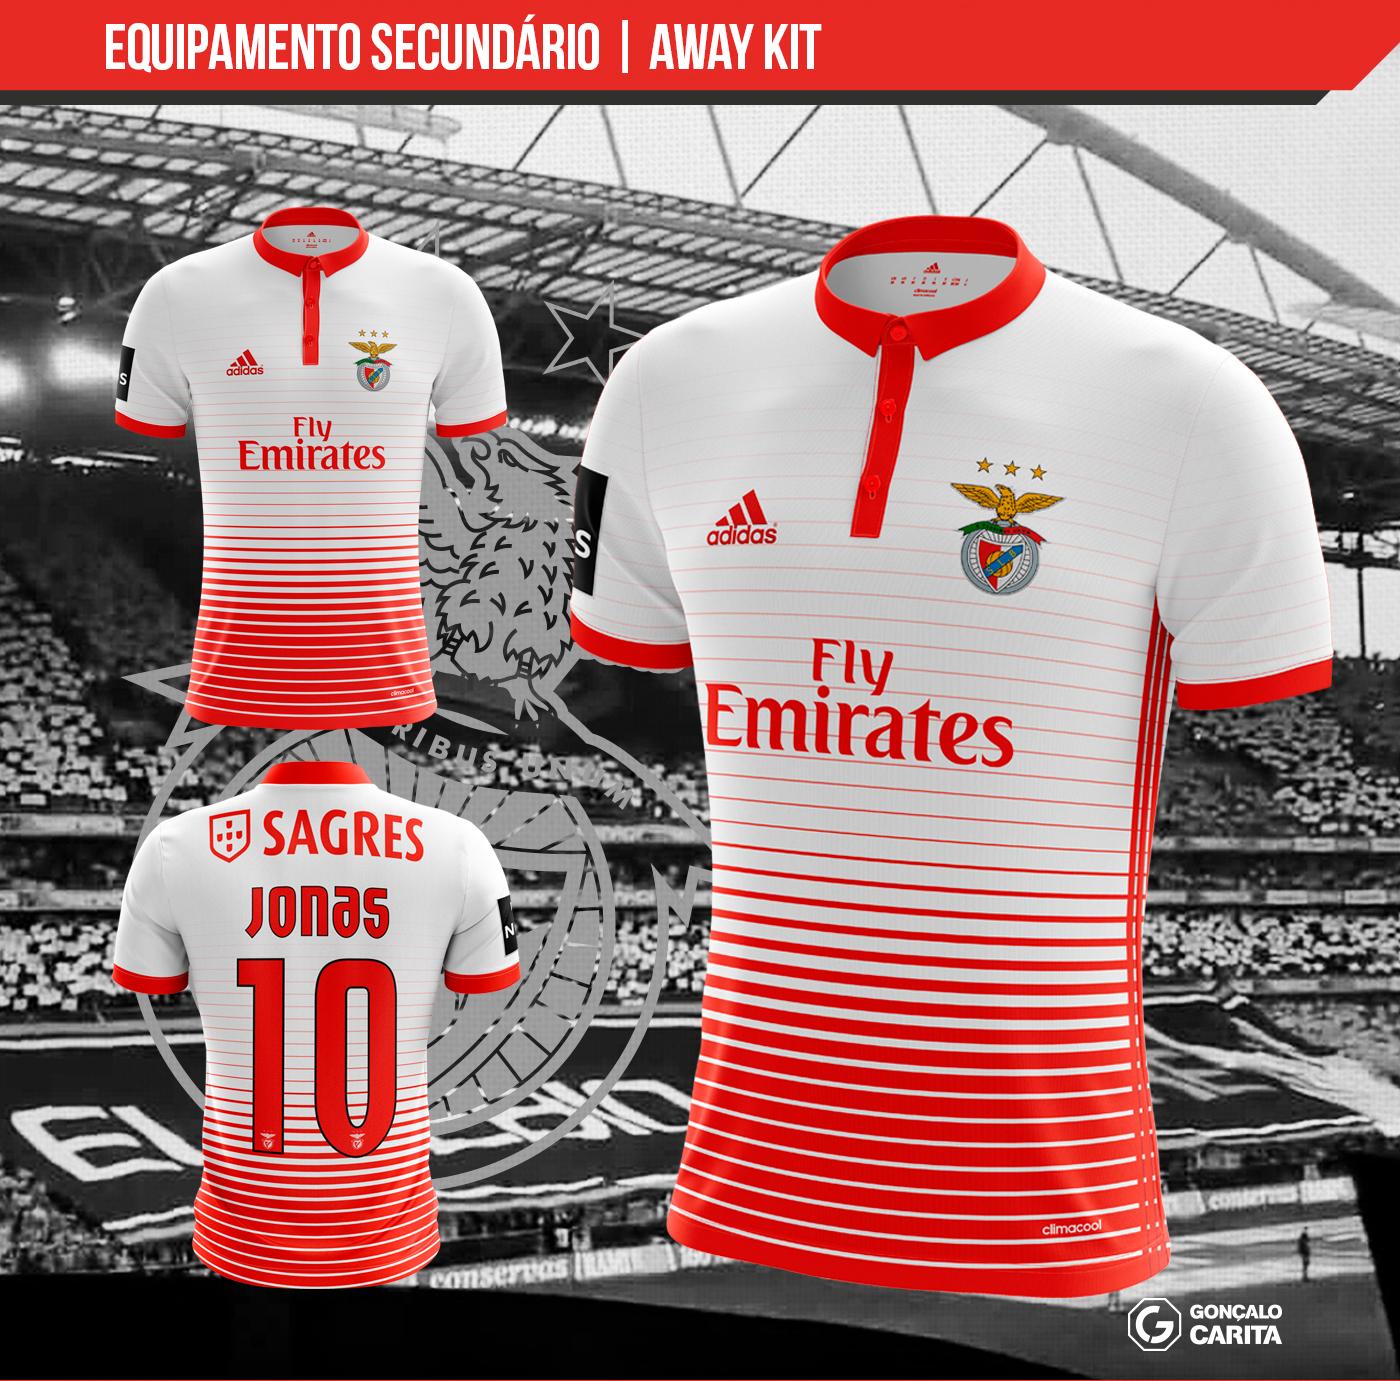 new concept c92dd a4b02 Sport Lisboa e Benfica - Concept Kits 2017 2018 Season on ...